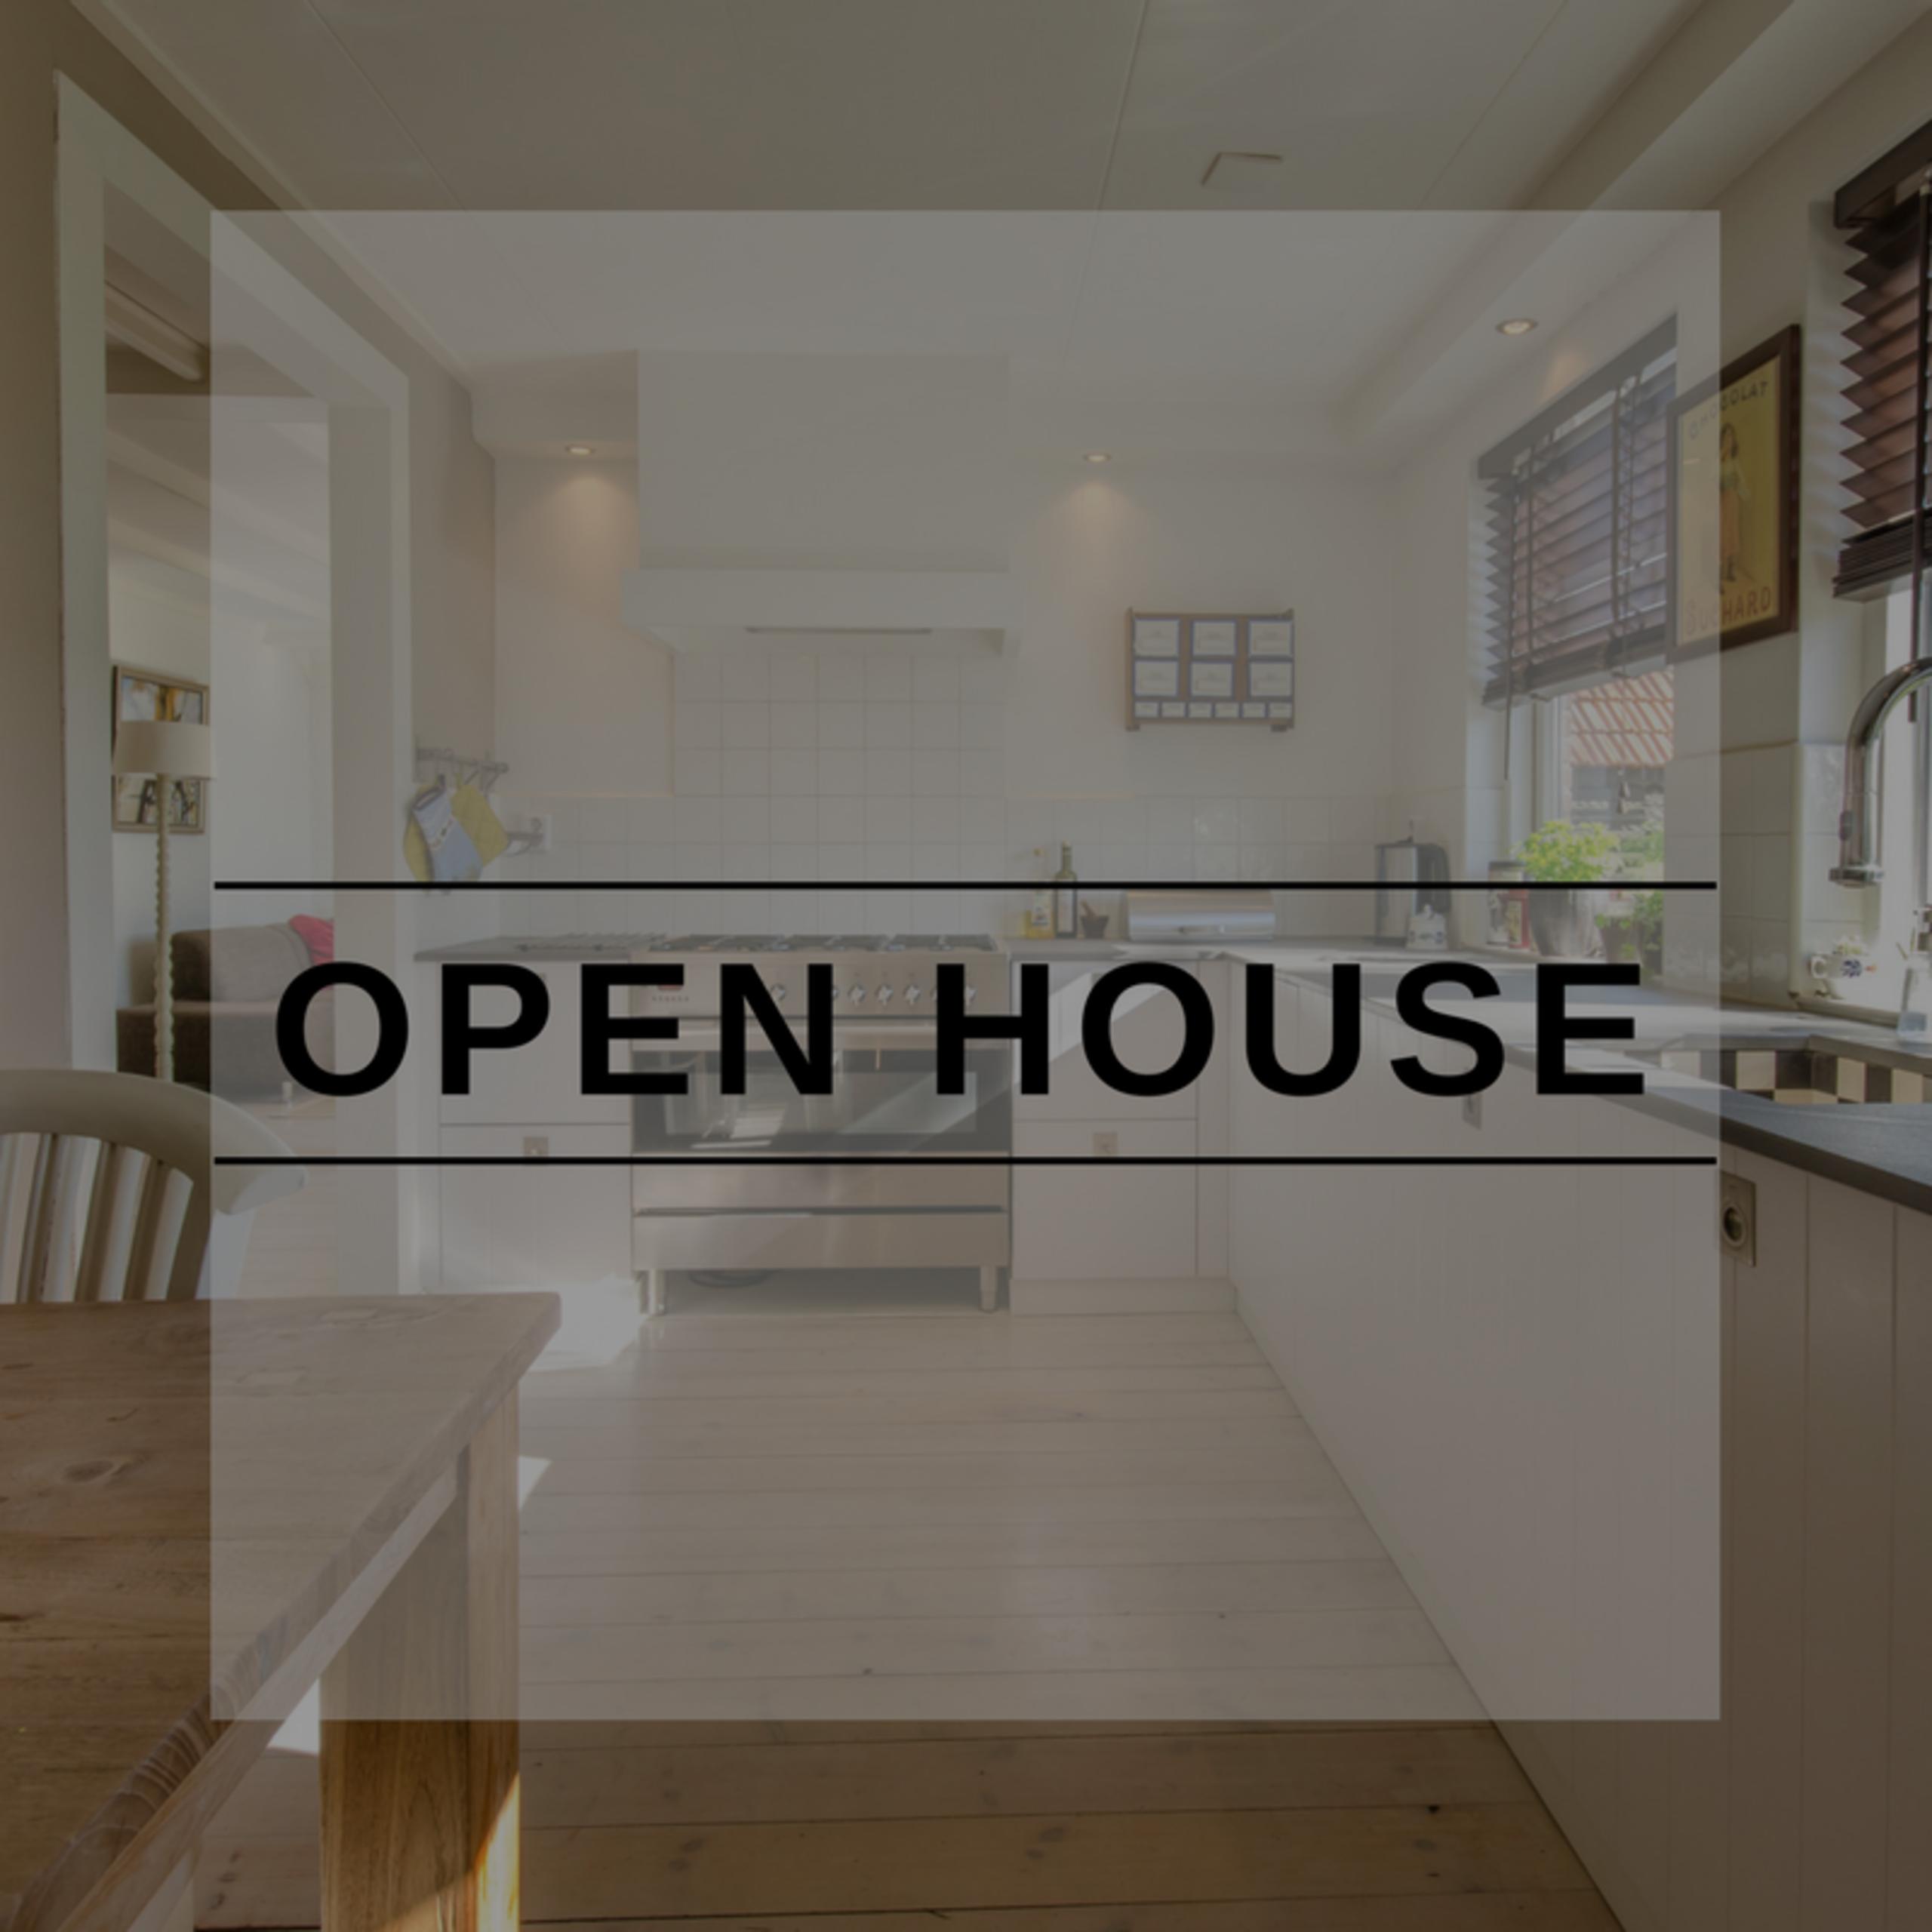 OPEN HOUSE LIST 3/3/18 – 3/4/18